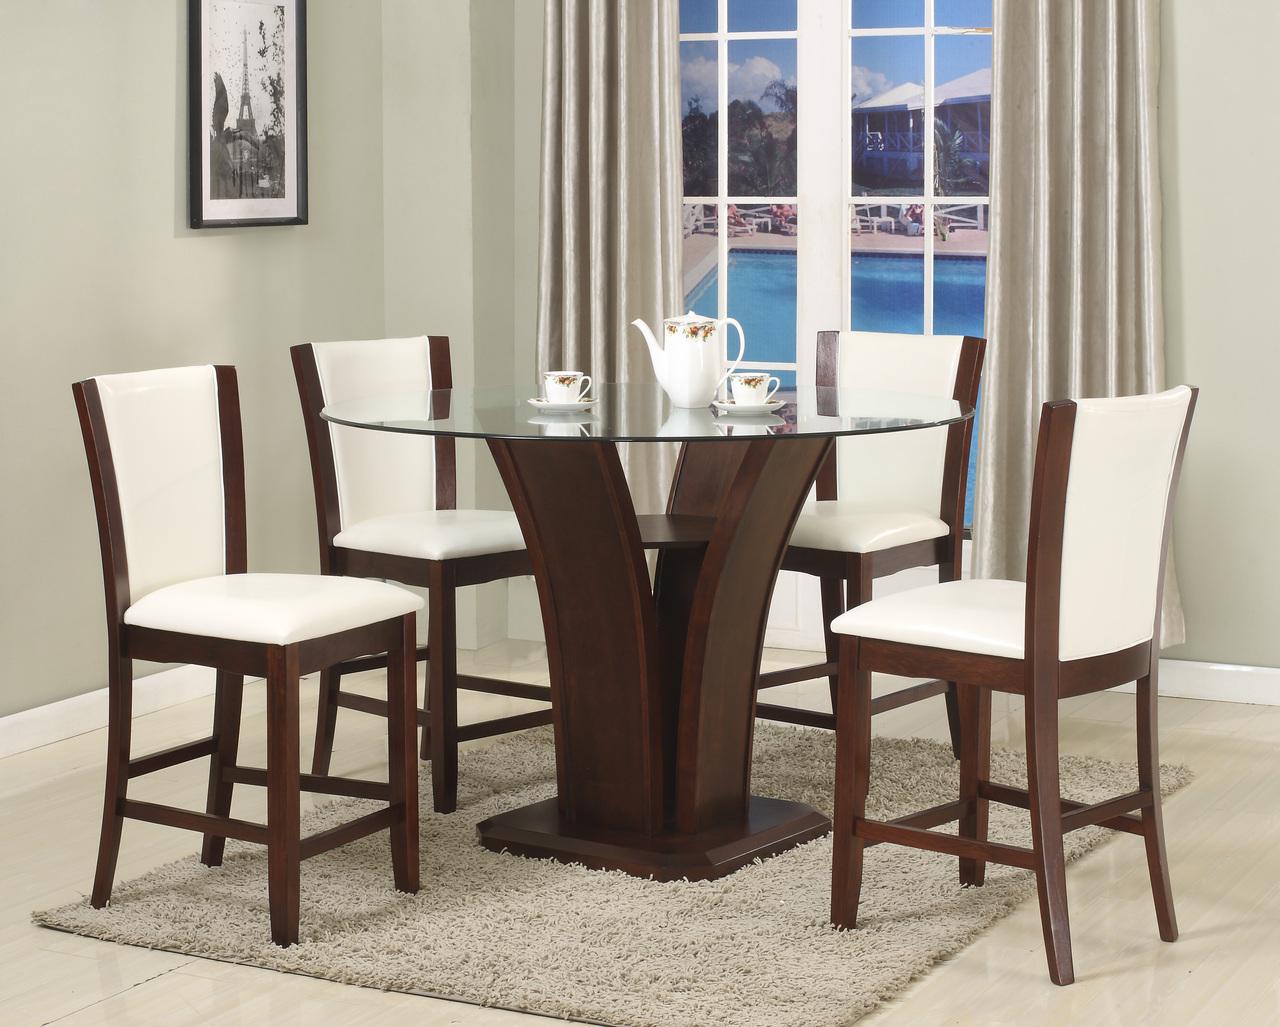 Carolina Rent To Own Furniture |appliances| Electronics ...